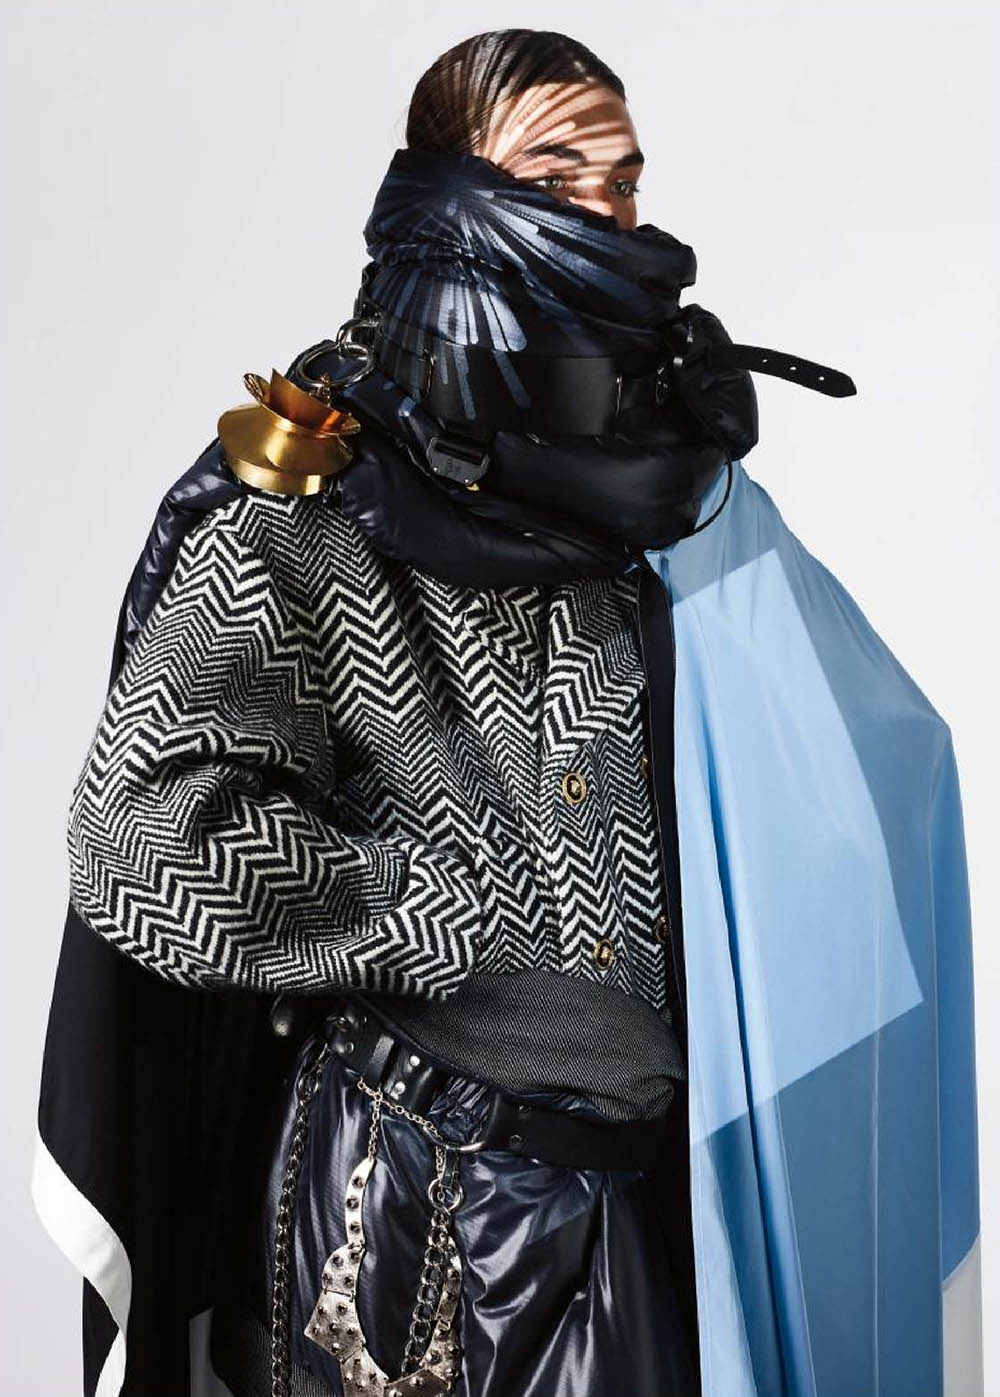 Niko Traubman by Richard Burbridge for VMan Fall Winter 2019